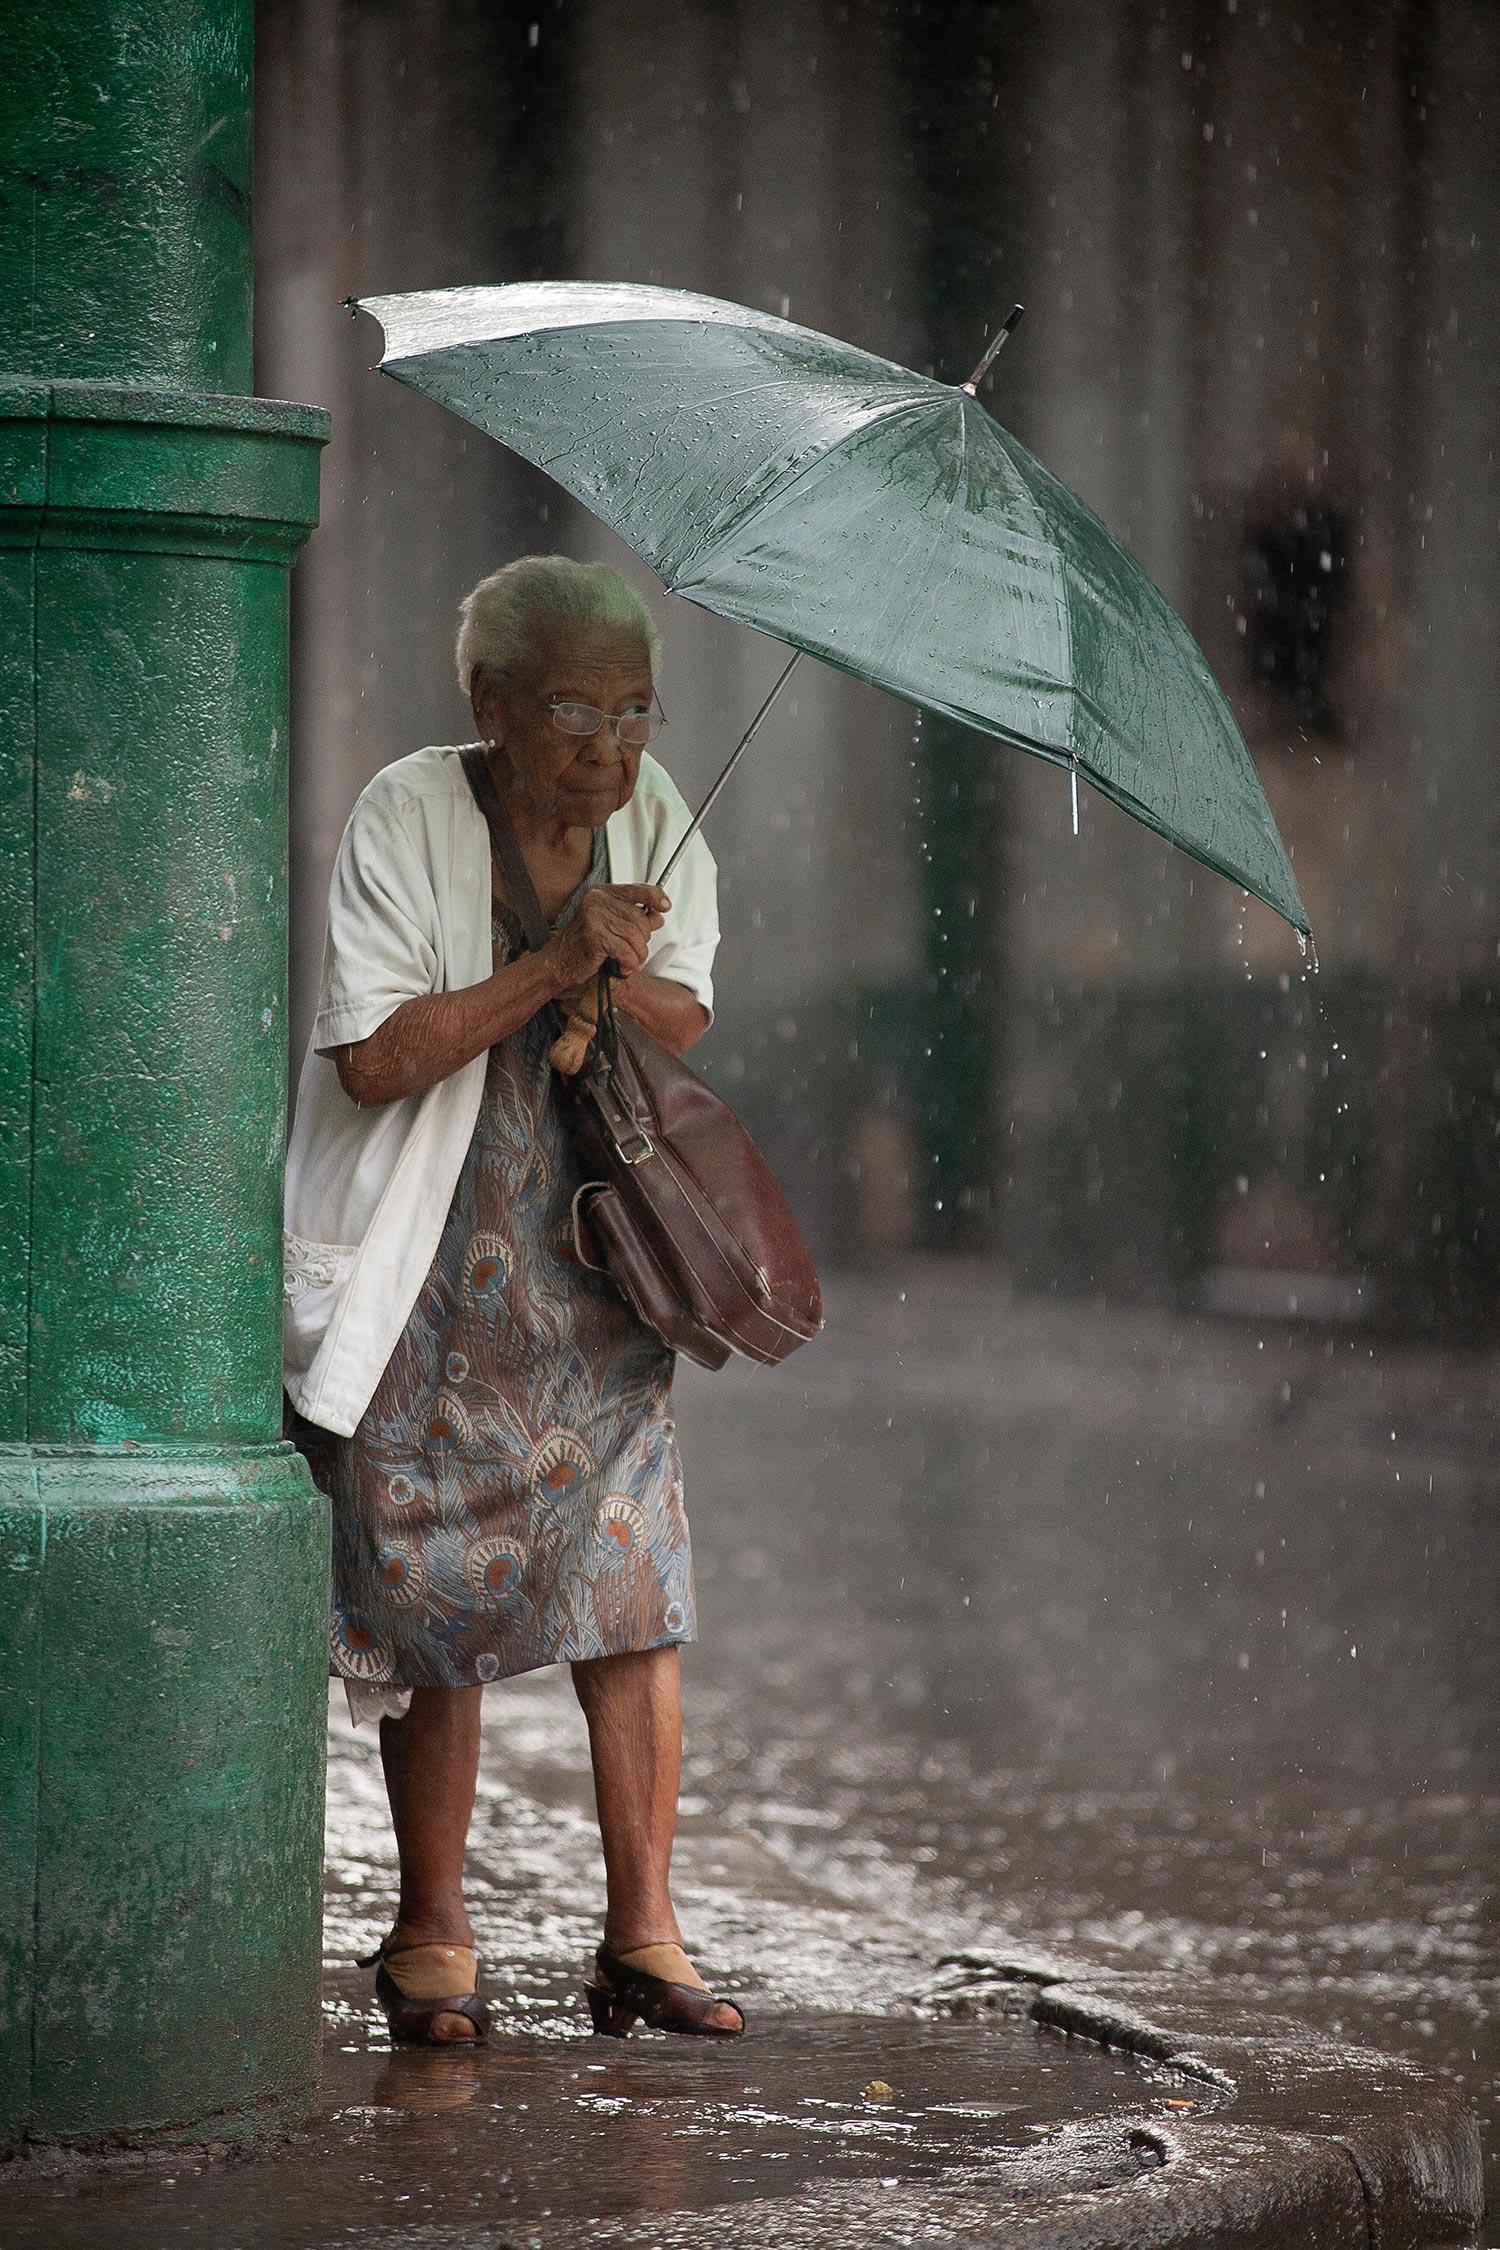 Alte Frau im Regen in Havanna